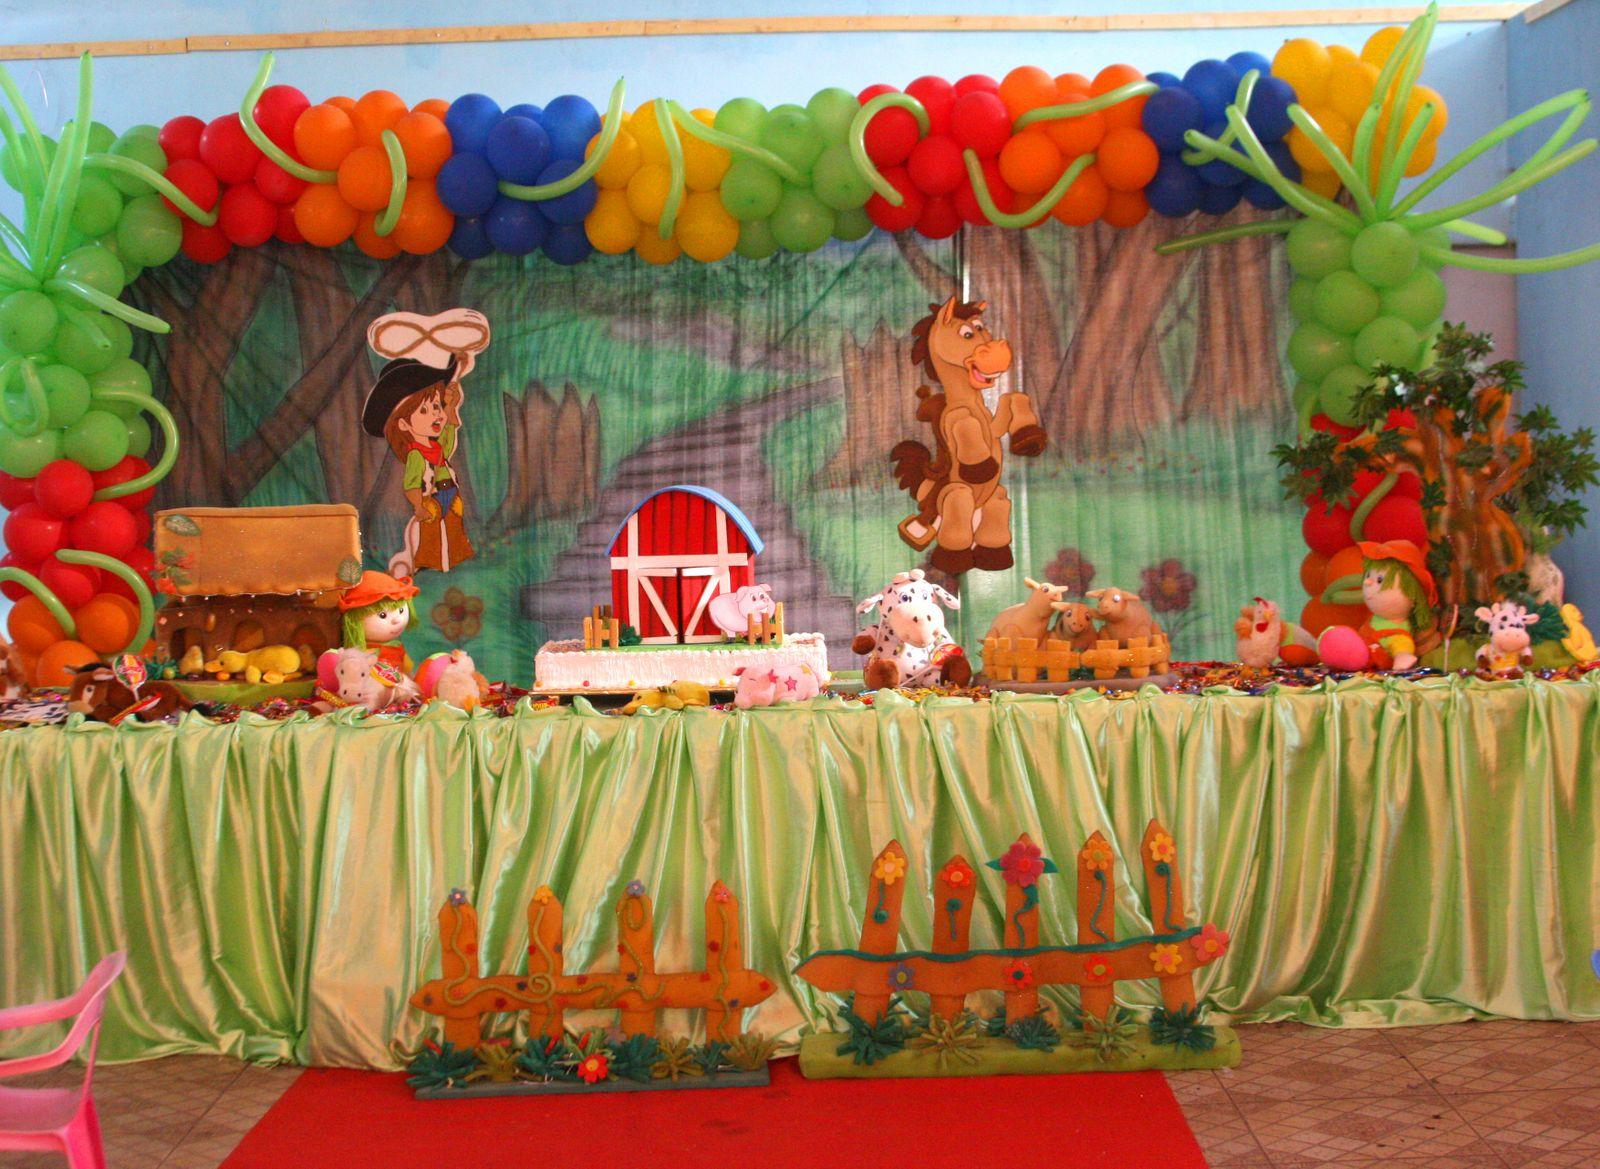 A y p fiestas decoracion de cumplea os infantiles for Decoracion de cumpleanos